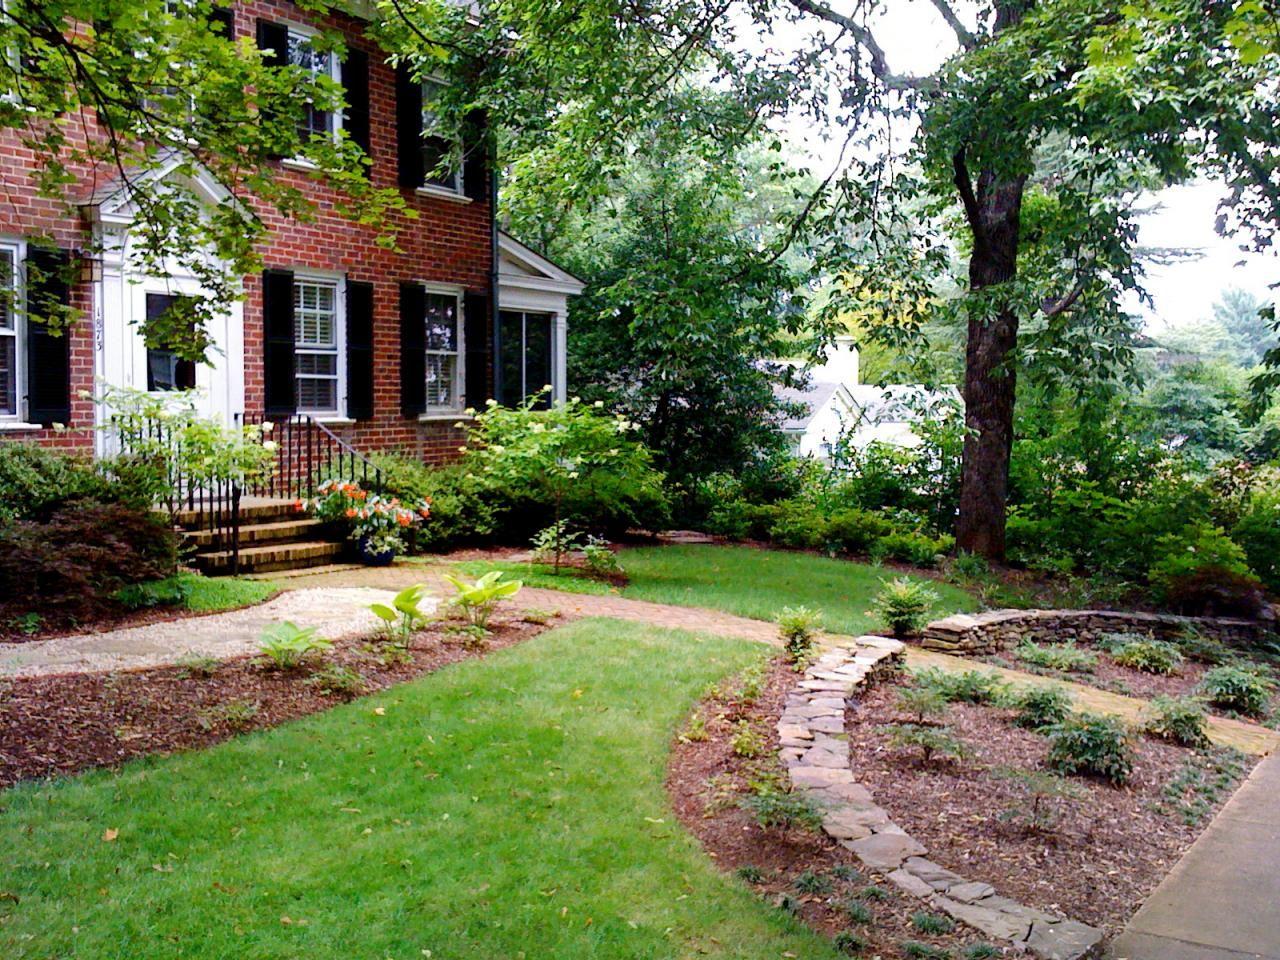 Simple landscaping creates an inviting elegant scene for Elegant landscaping